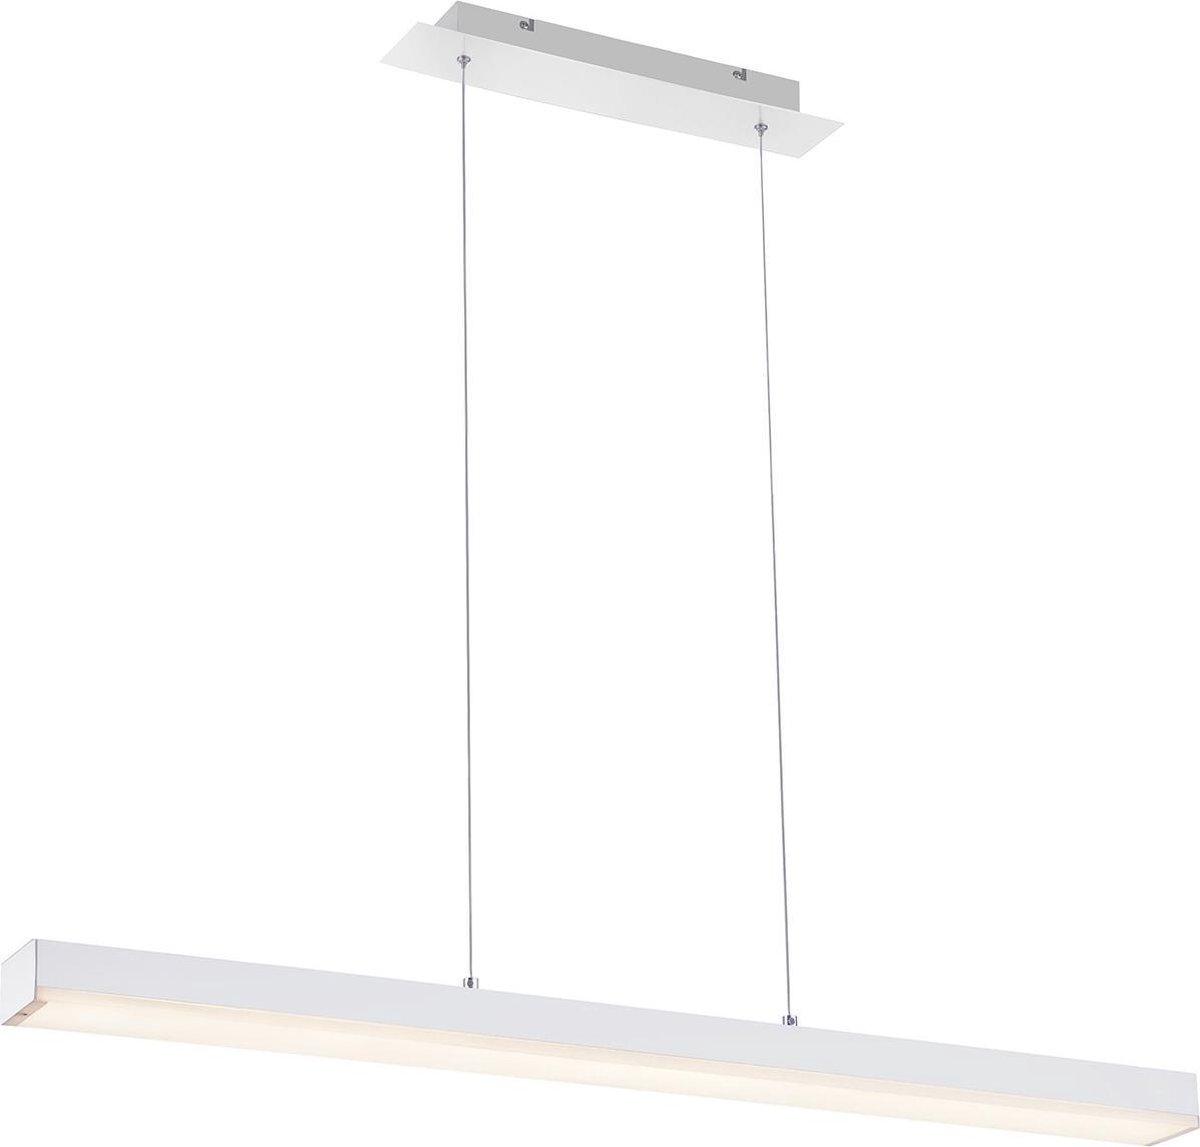 LED Hanglamp WiZ - Smart LED - Hangverlichting - Iona Lavar - 20W - Aanpasbare Kleur - RGBW - Rechthoek - Mat Wit - Aluminium